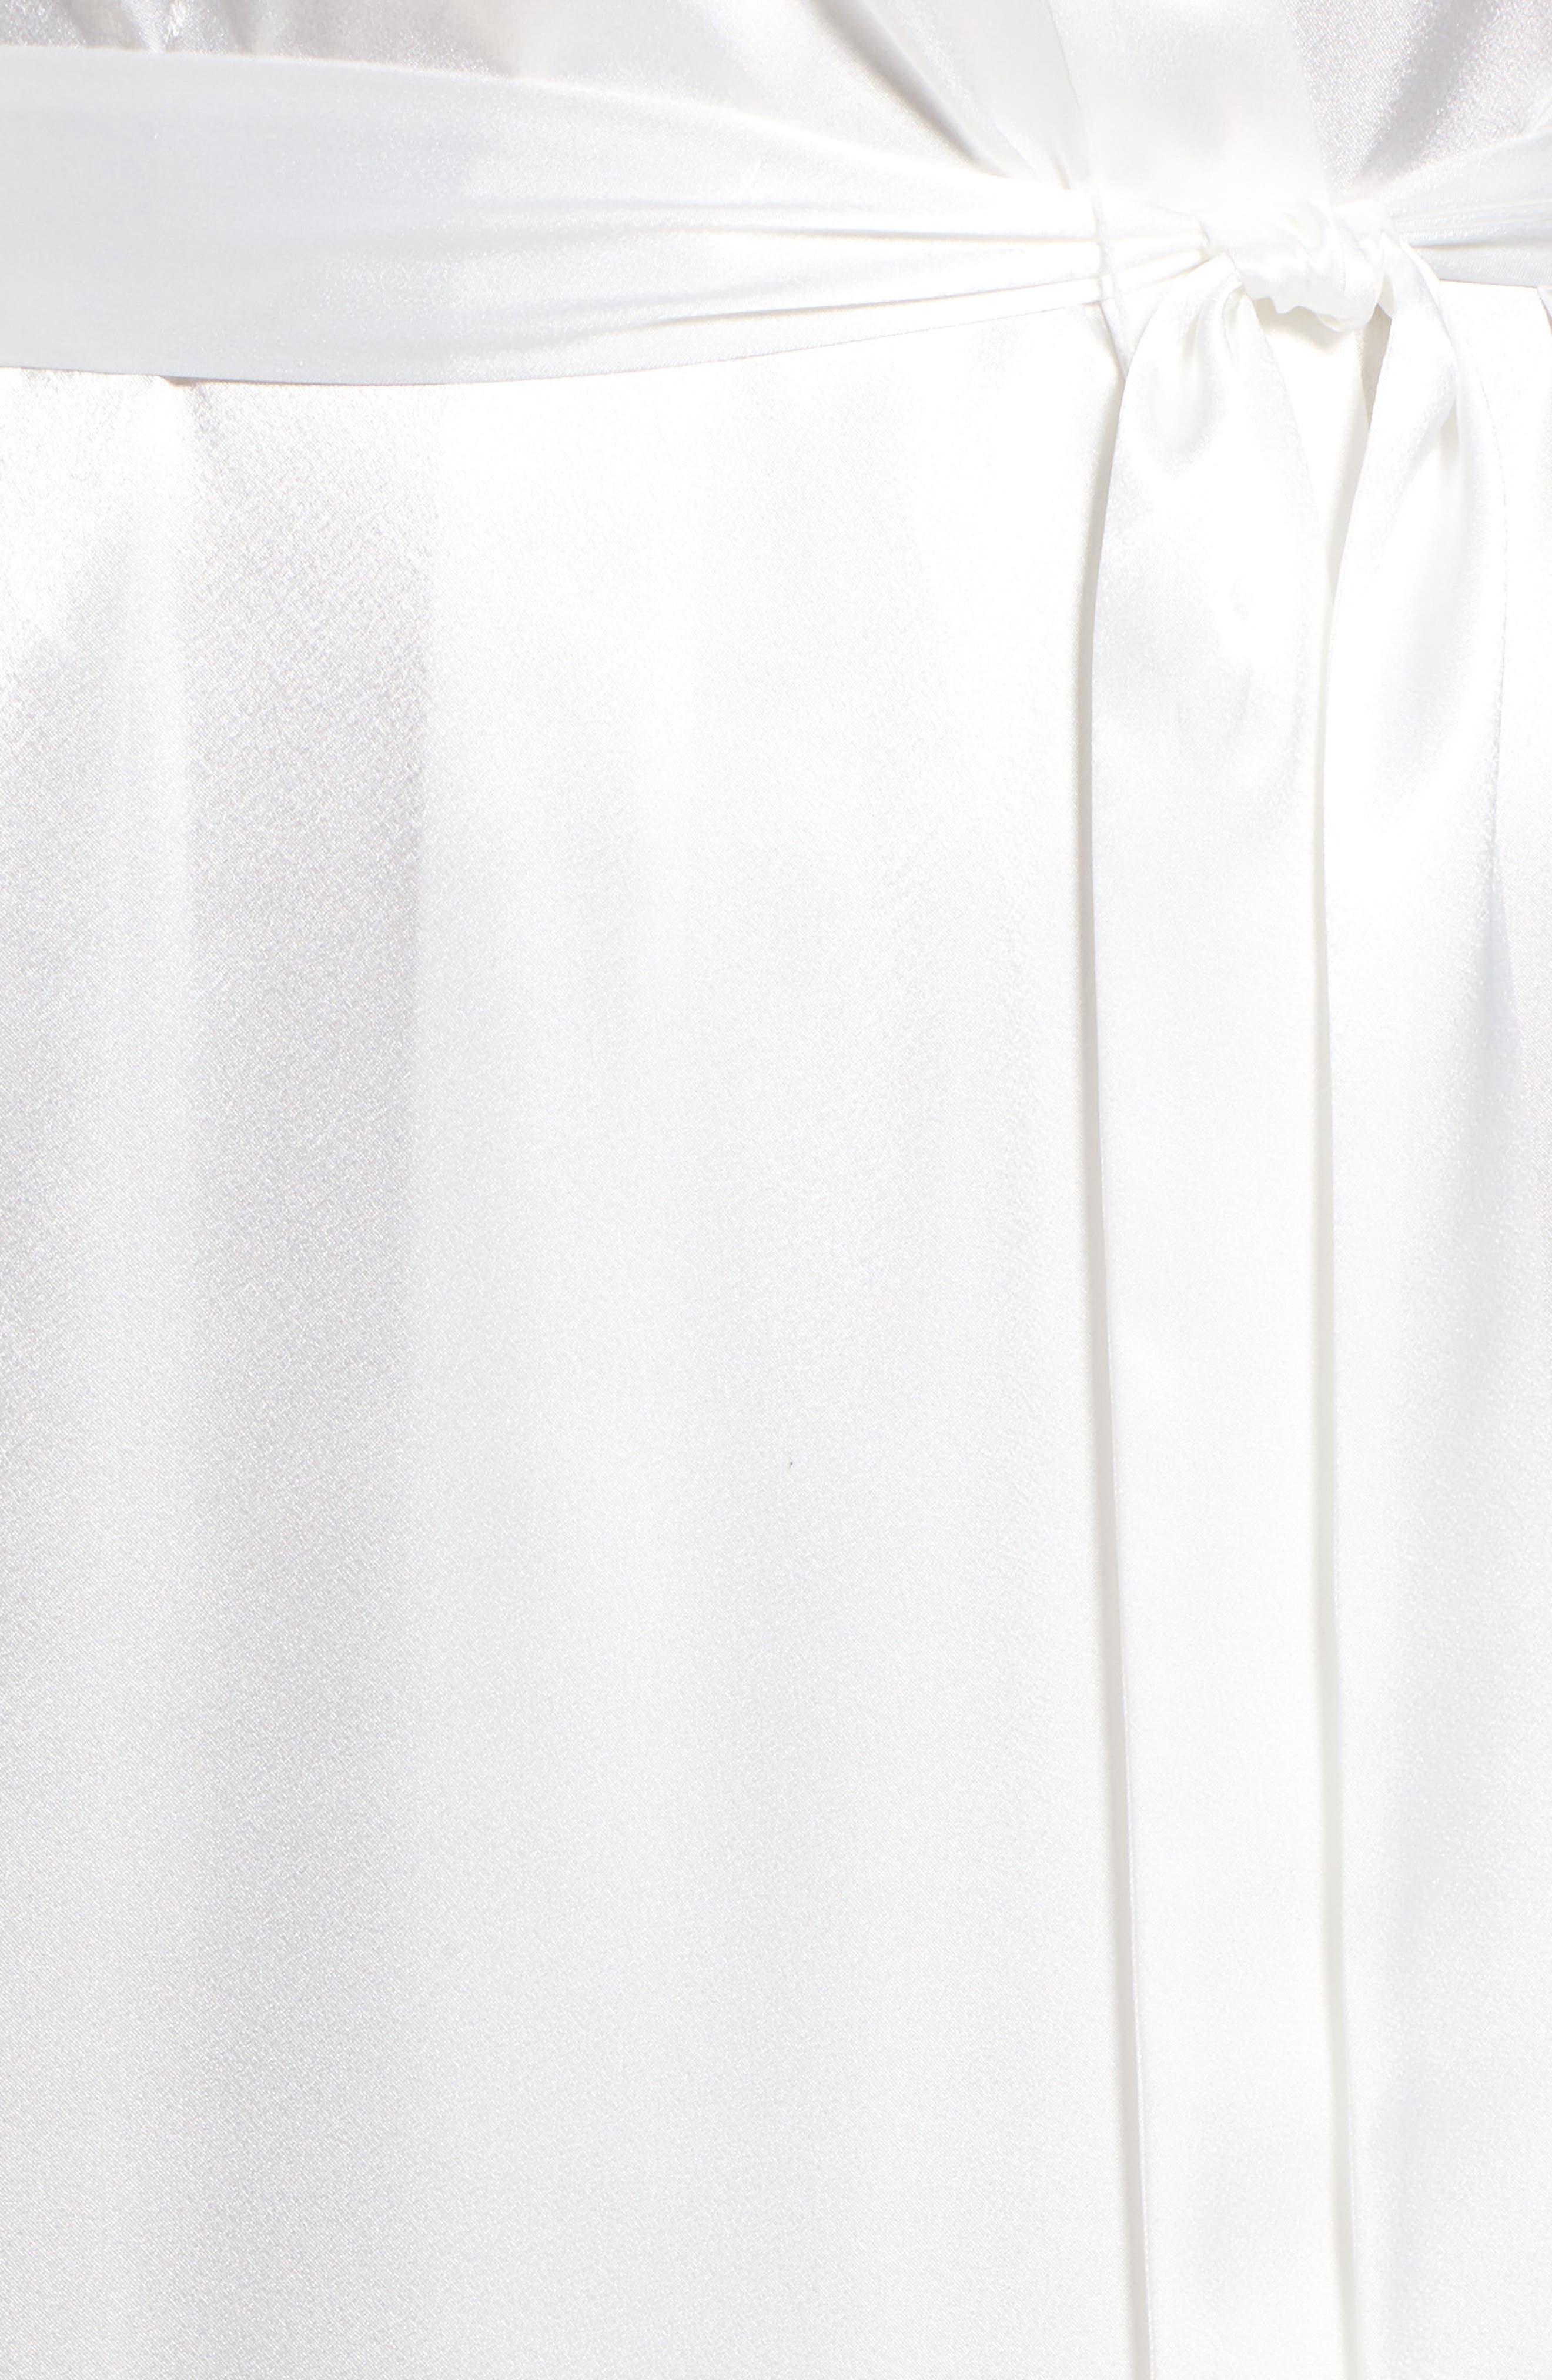 Sleepwear Charmeuse Robe,                             Alternate thumbnail 5, color,                             178